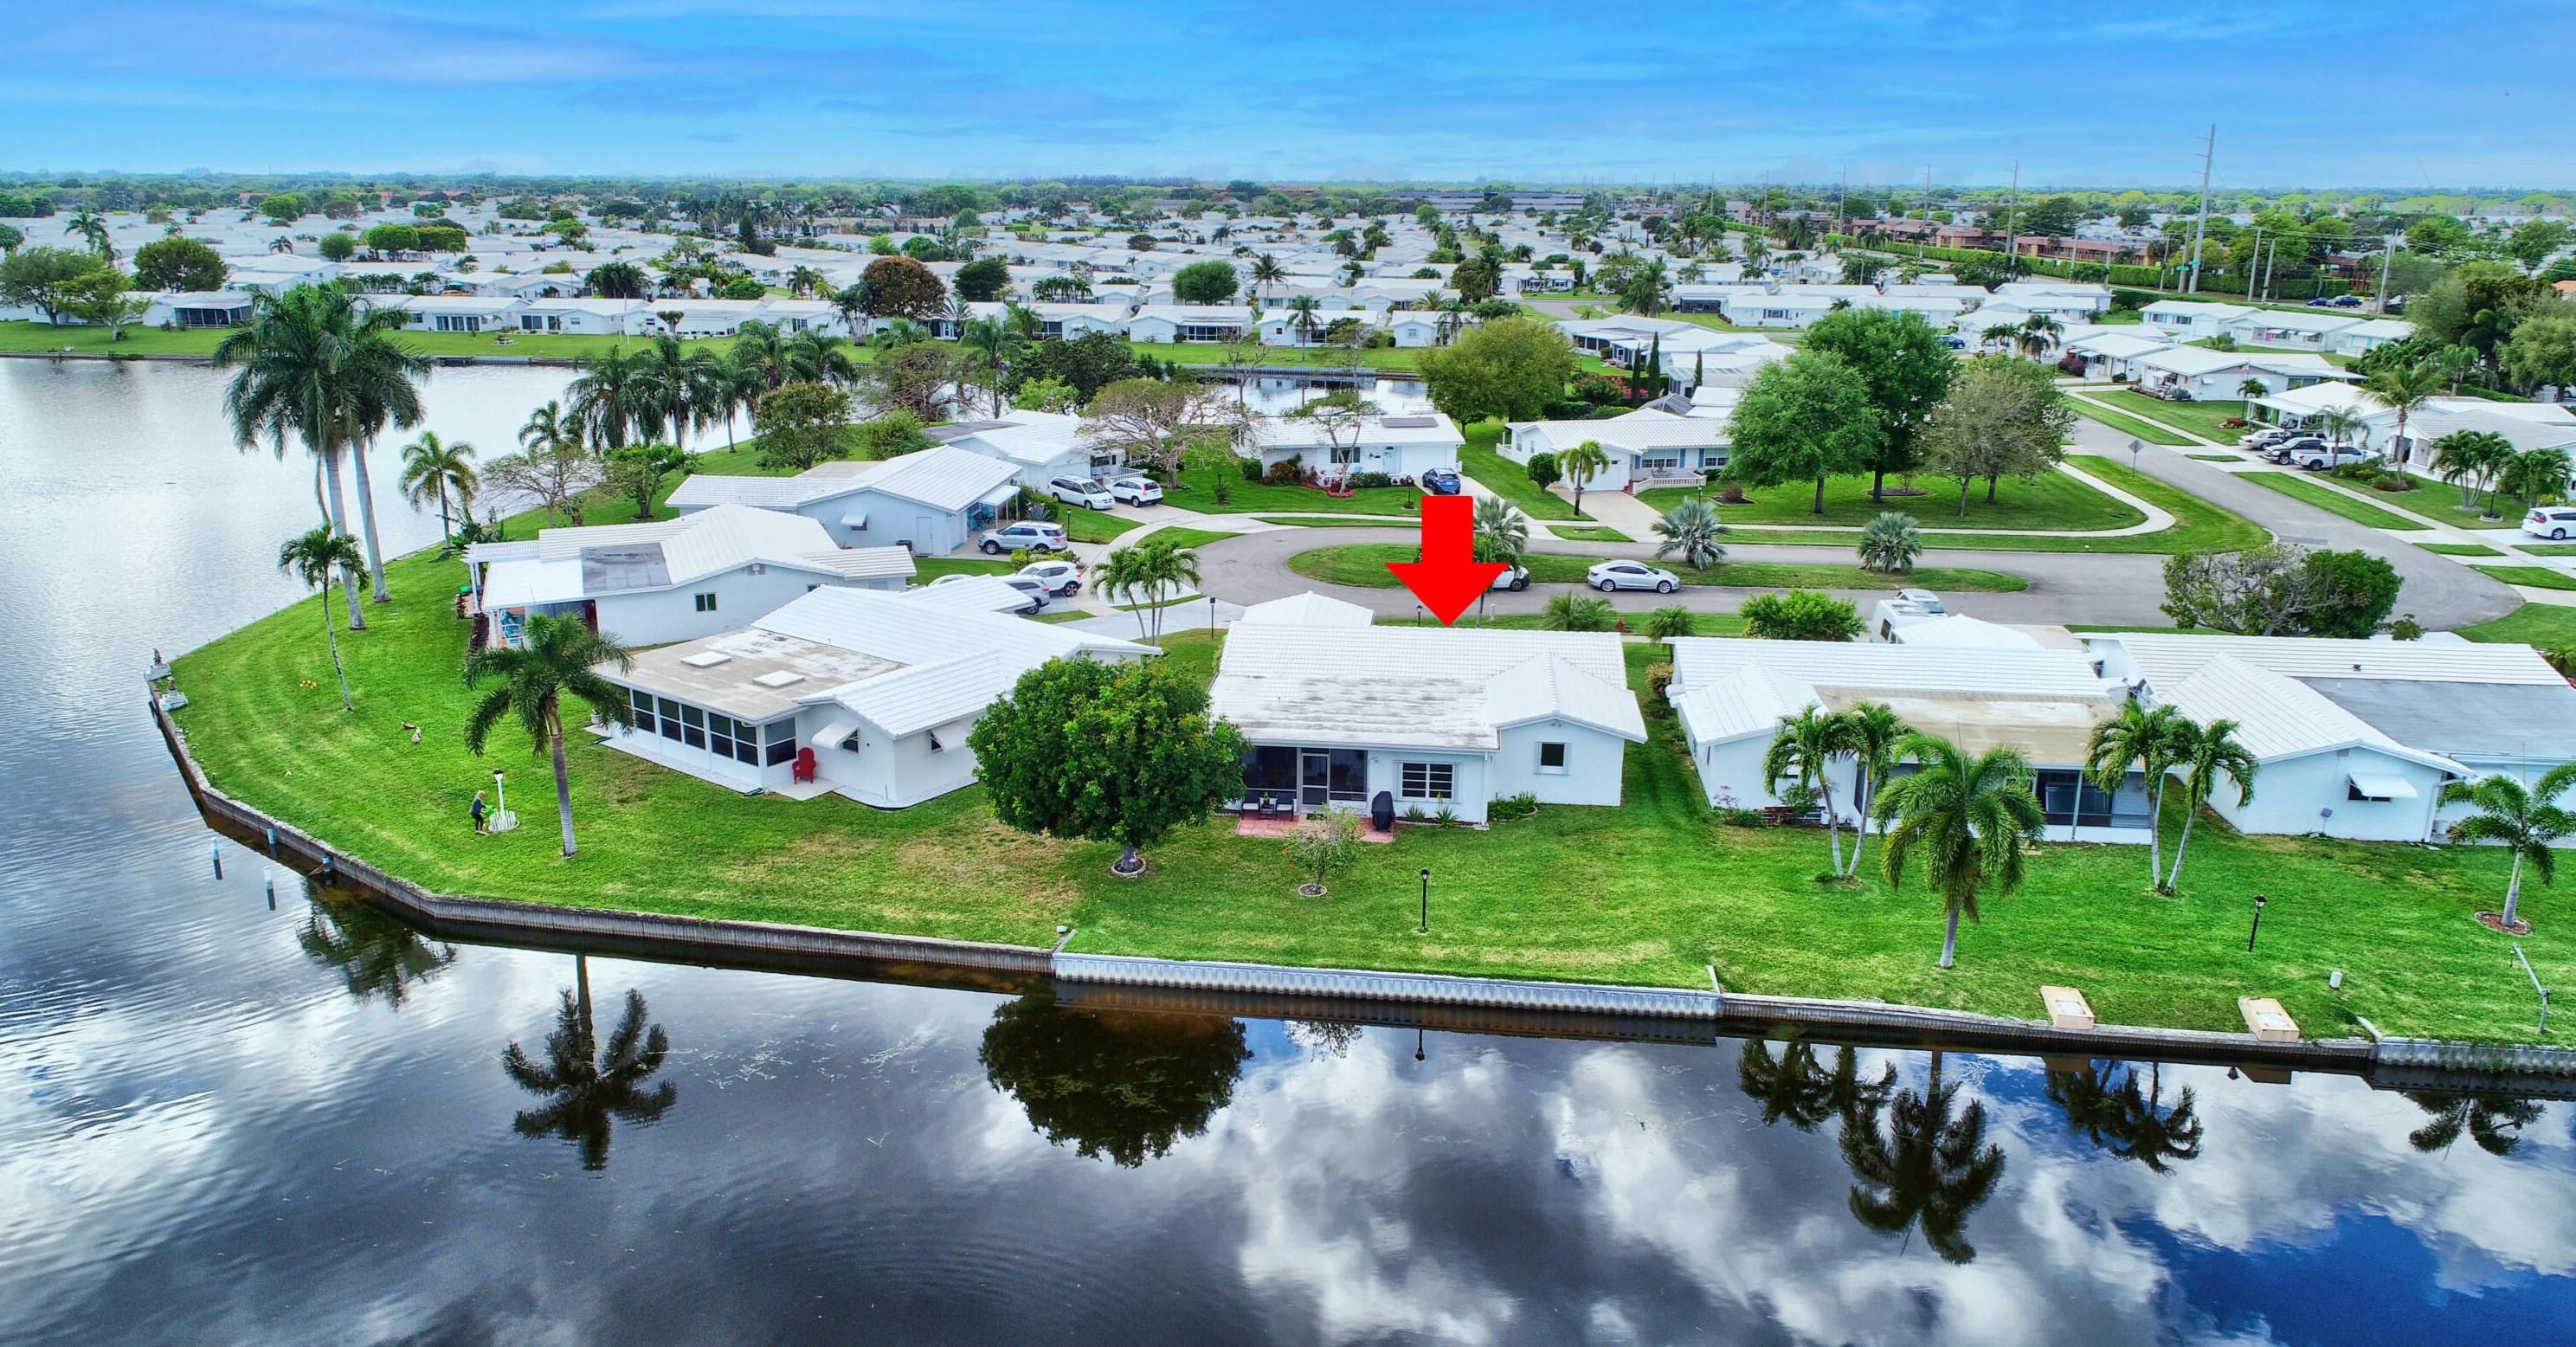 1393 Sw 17th Ave, Boynton Beach, FL 33426